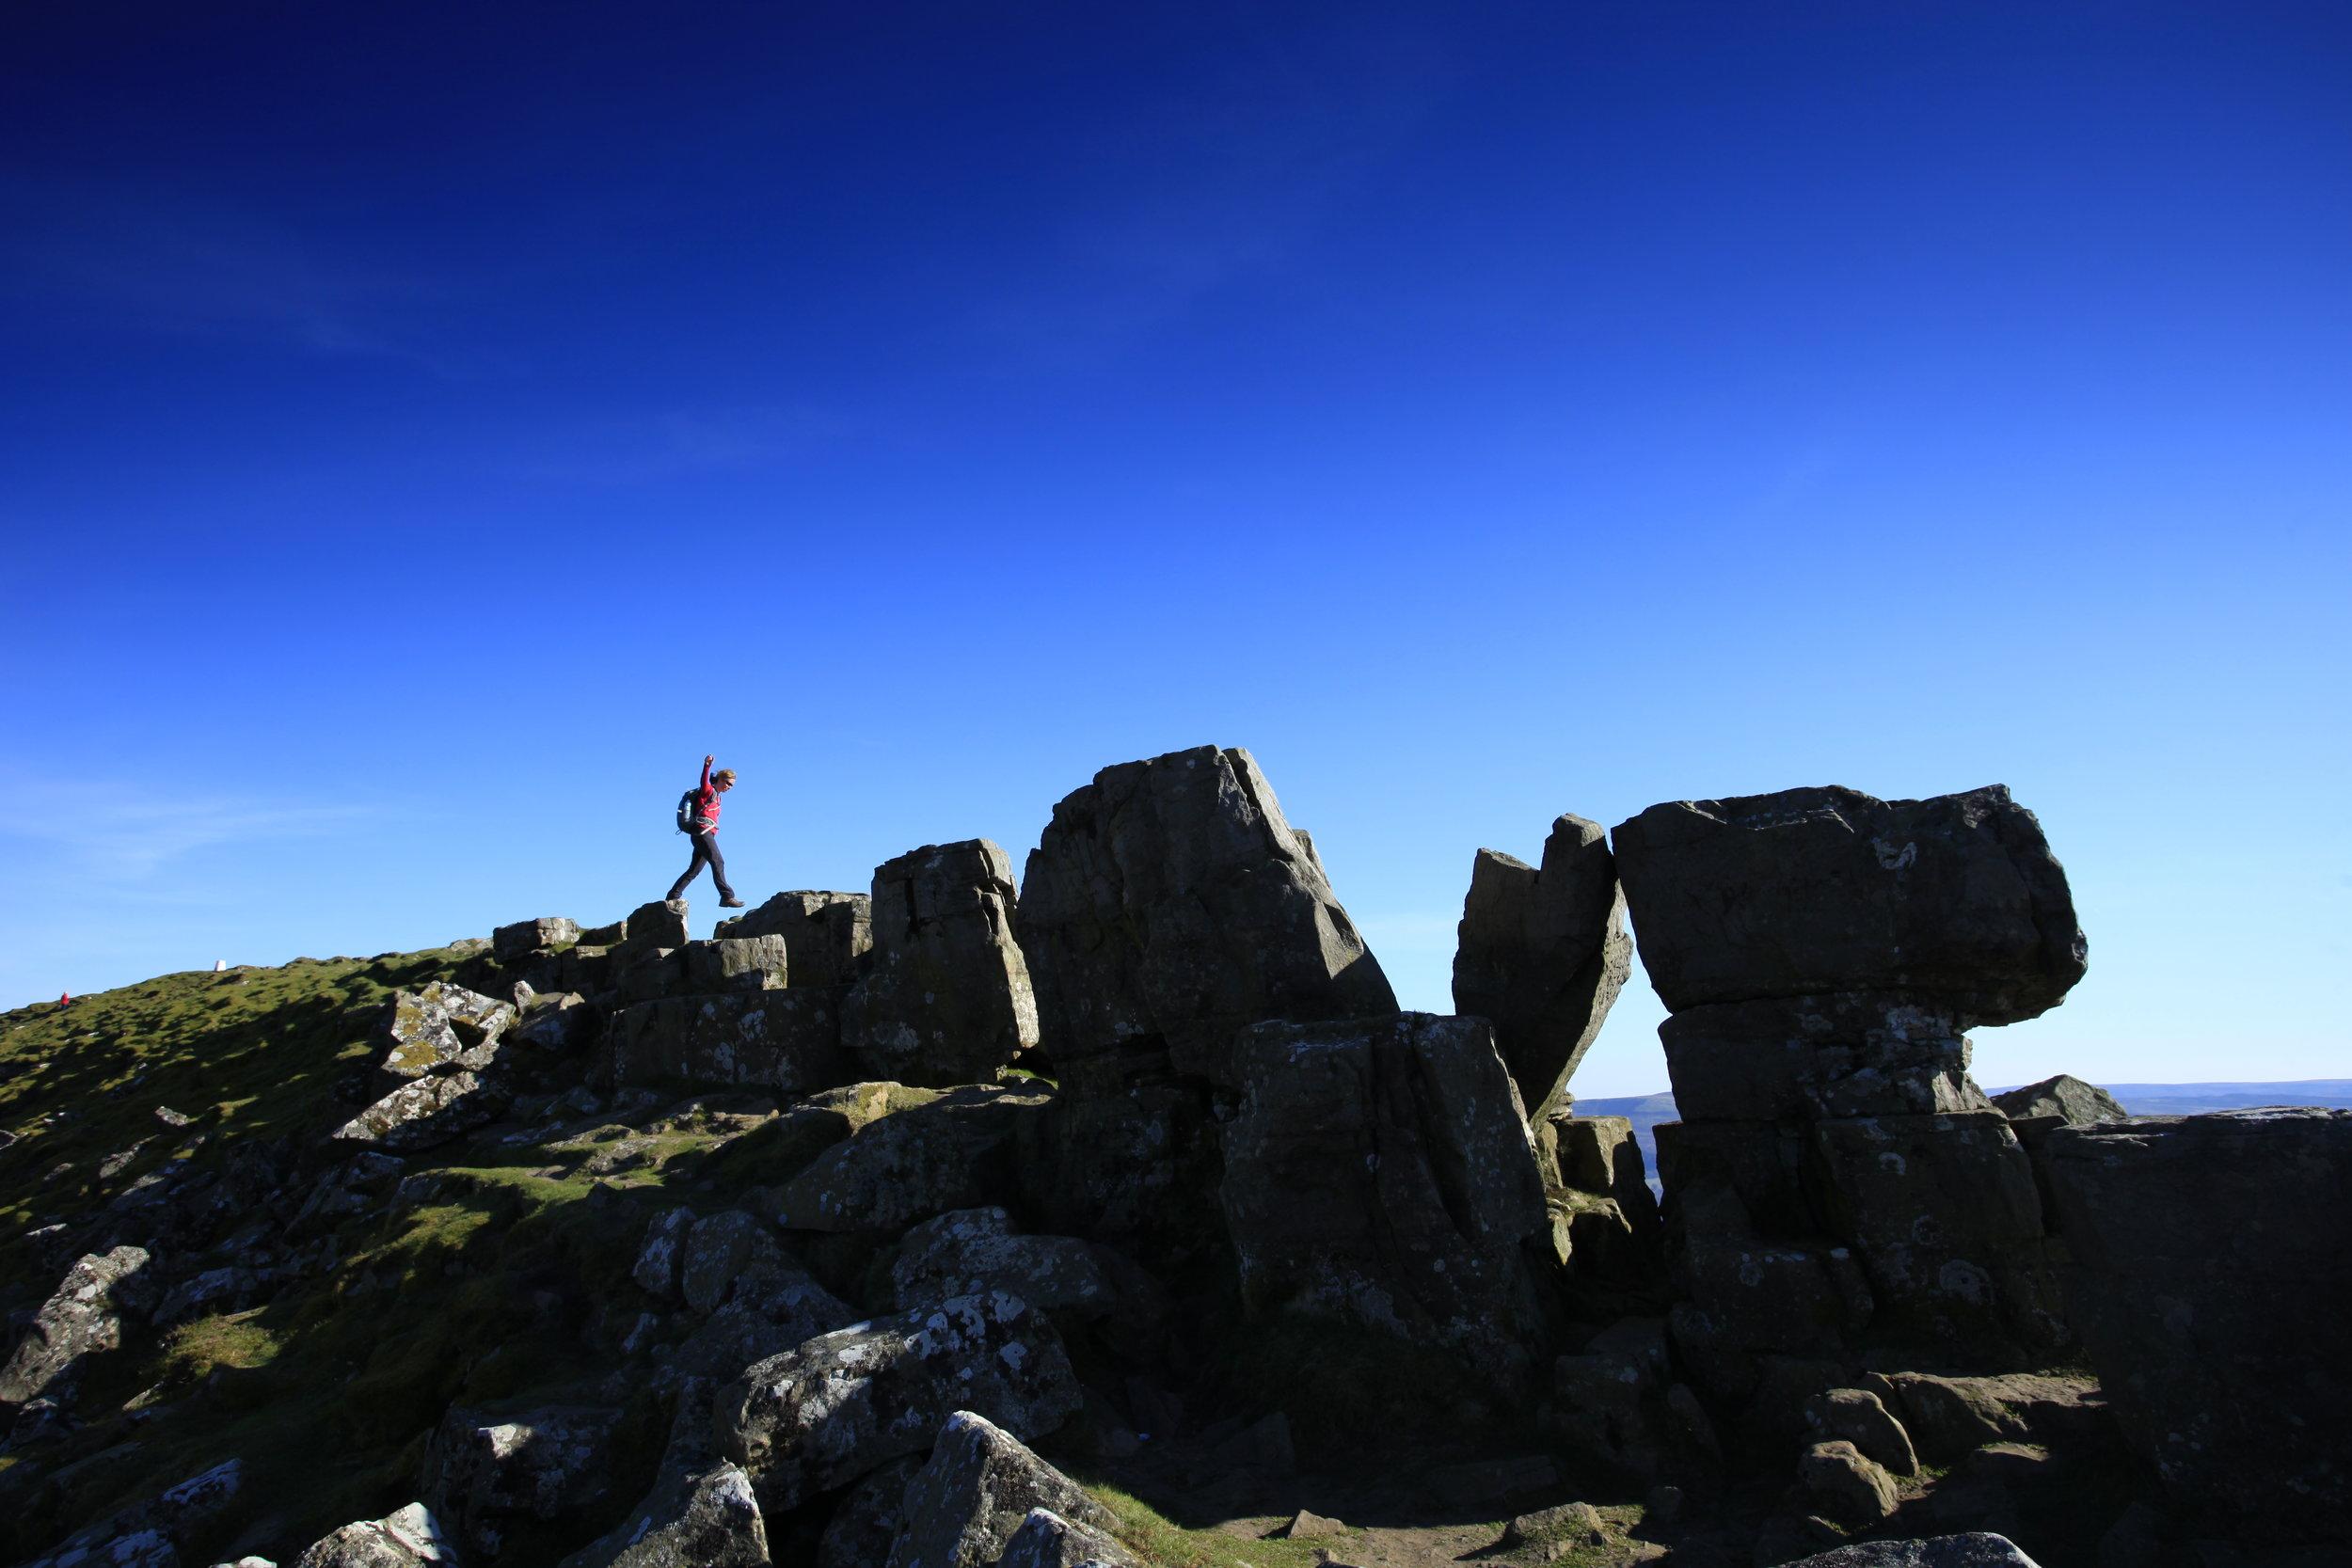 It needn't be a rocky road ahead!